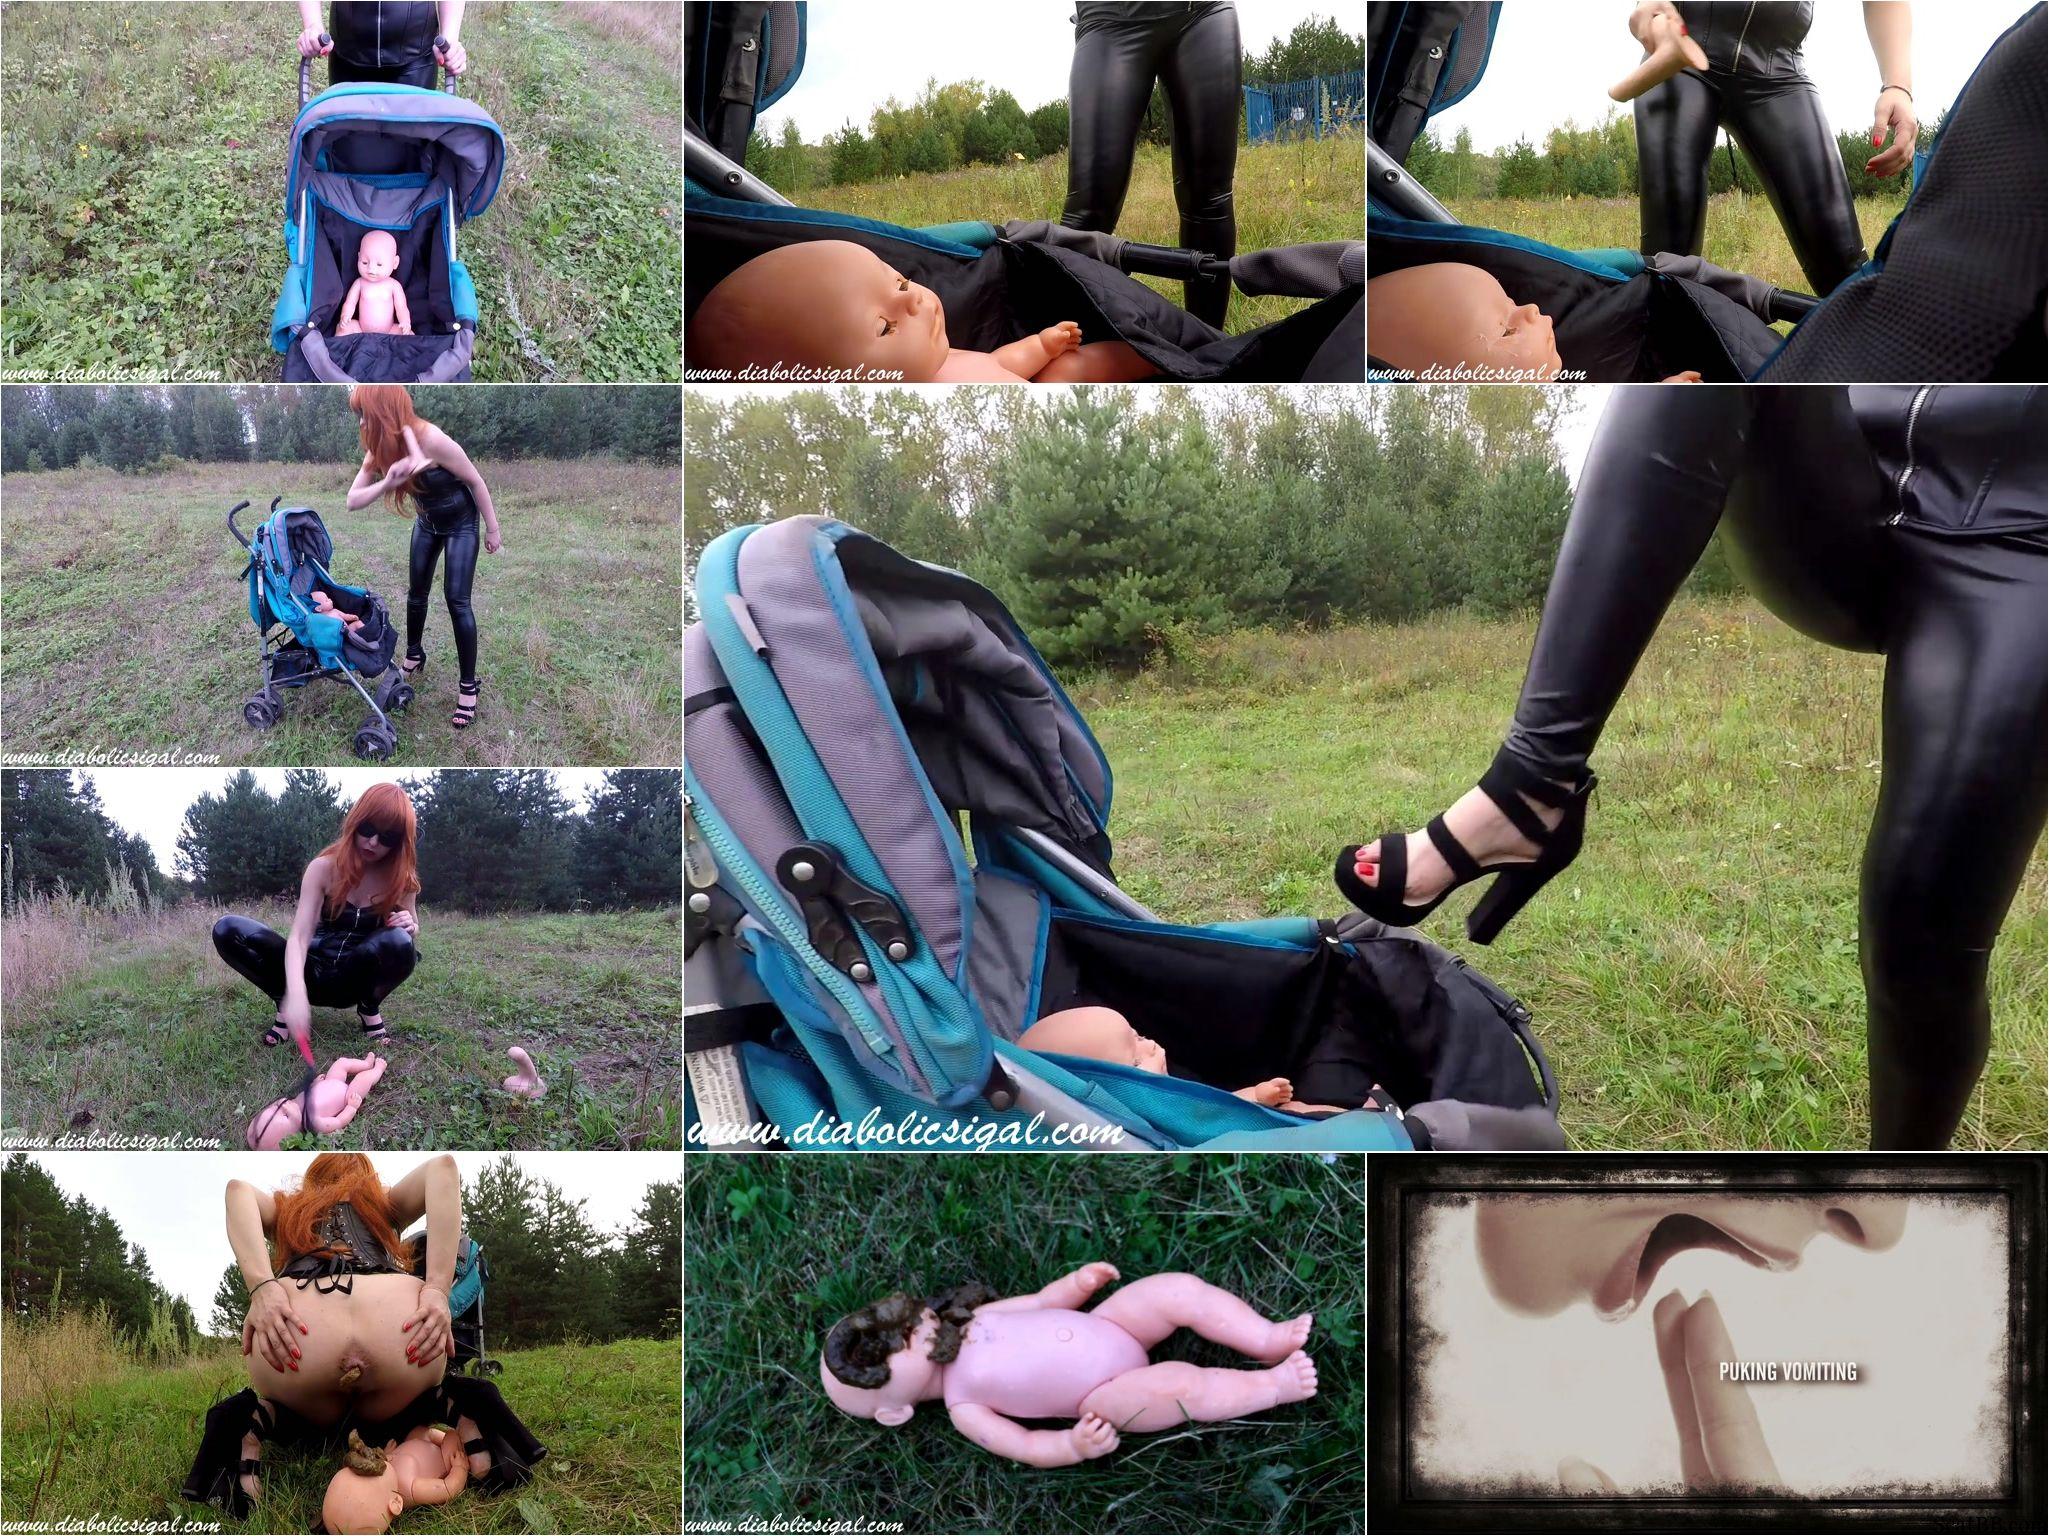 Diabolic_Sigal_-_Dirty_babysitter_shits_on_crybaby_.ScrinList.jpg